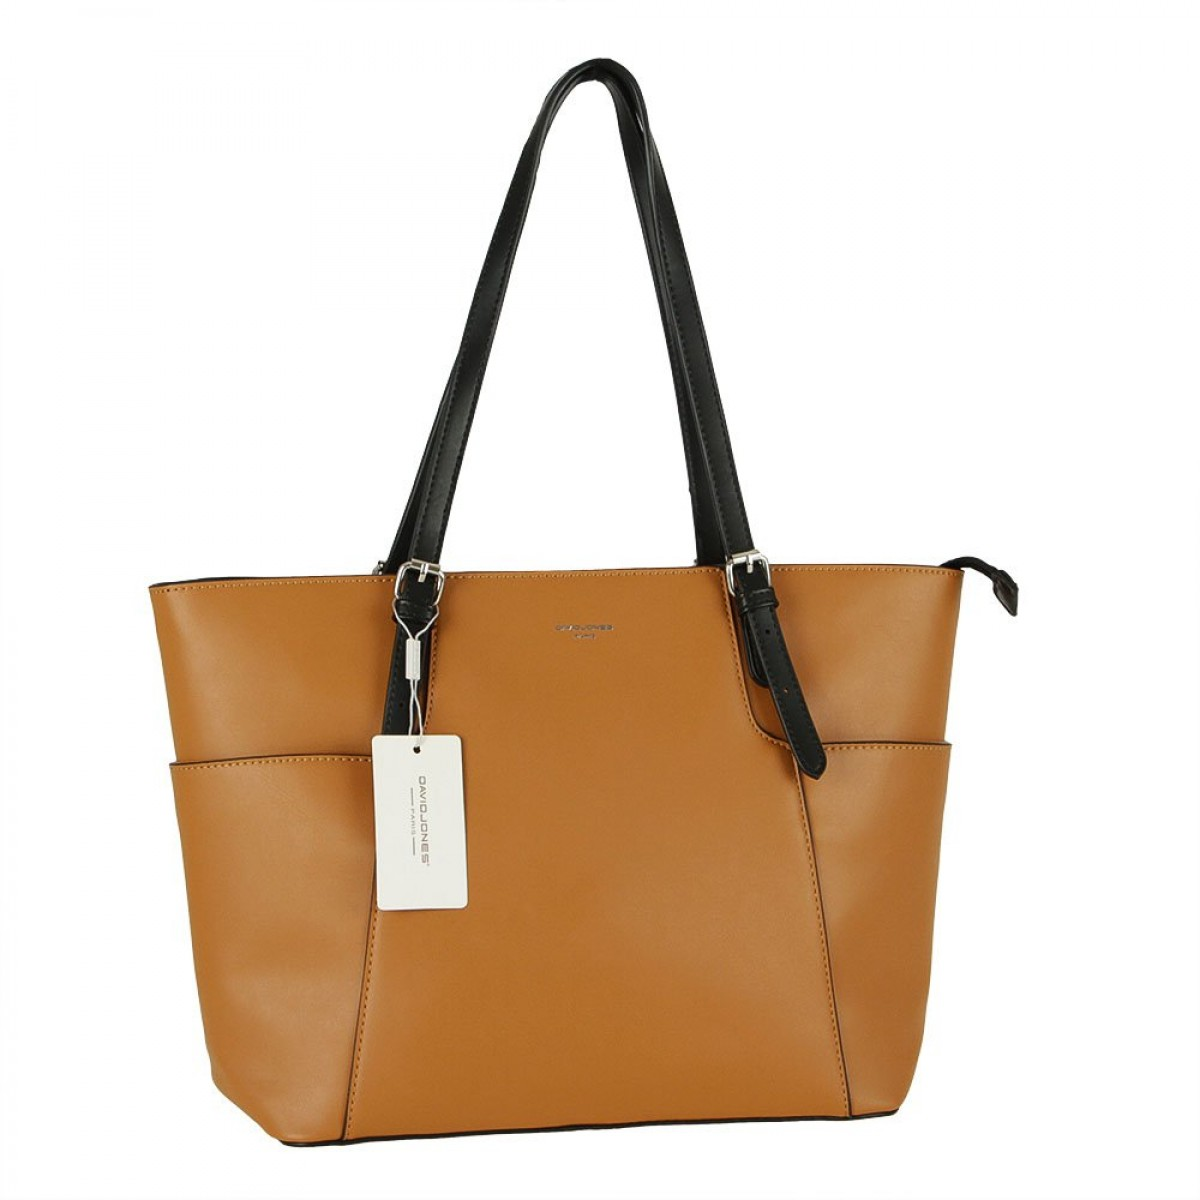 Жіноча сумка David Jones CM5887 MUSTARD